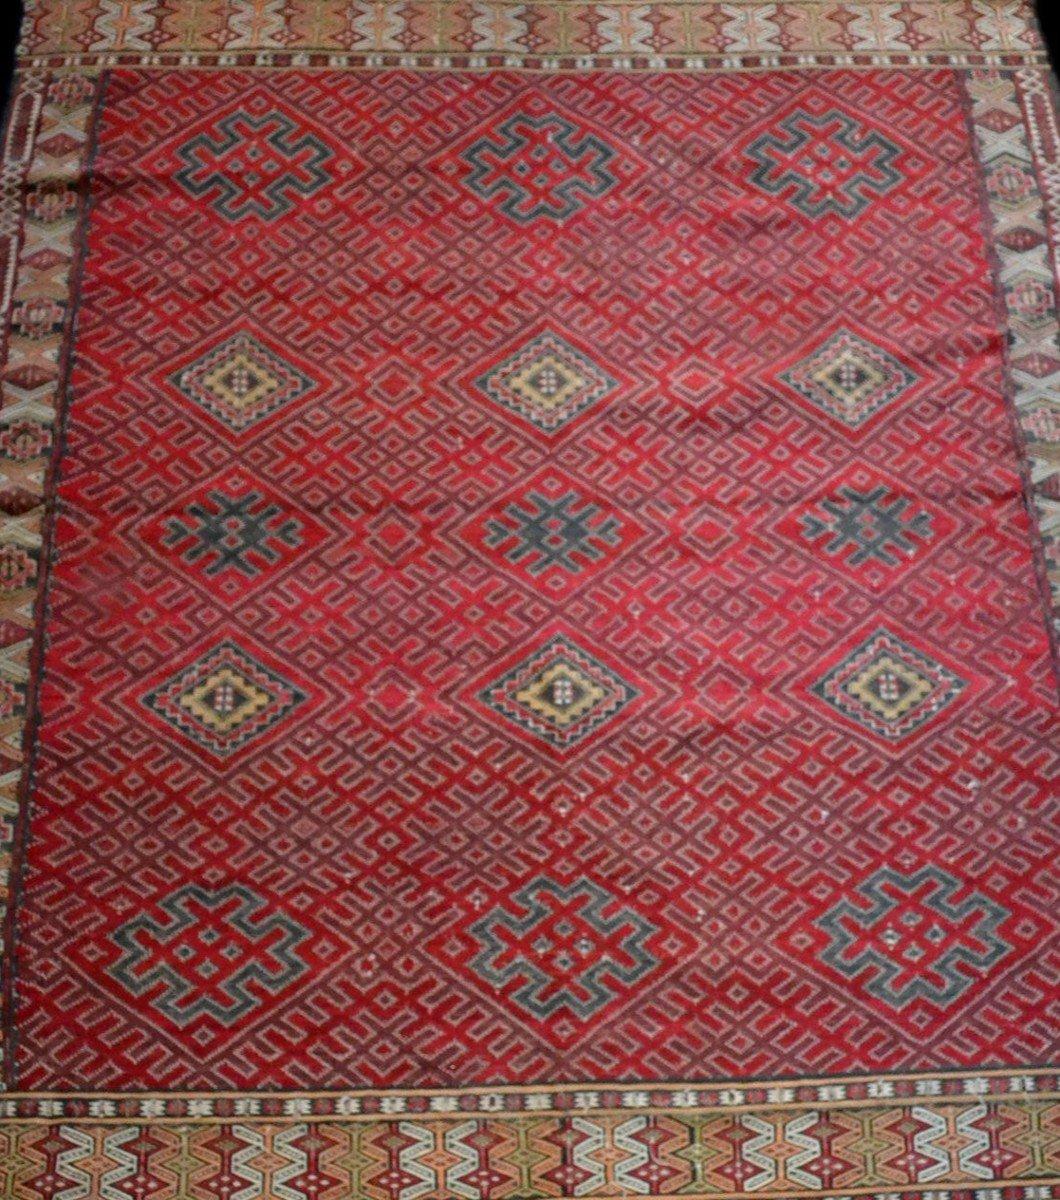 Important Hanbel, tapis ancien, tribu Zemmour, Moyen-Atlas, Maroc, 210 cm x 323 cm, 1950/1960 -photo-1